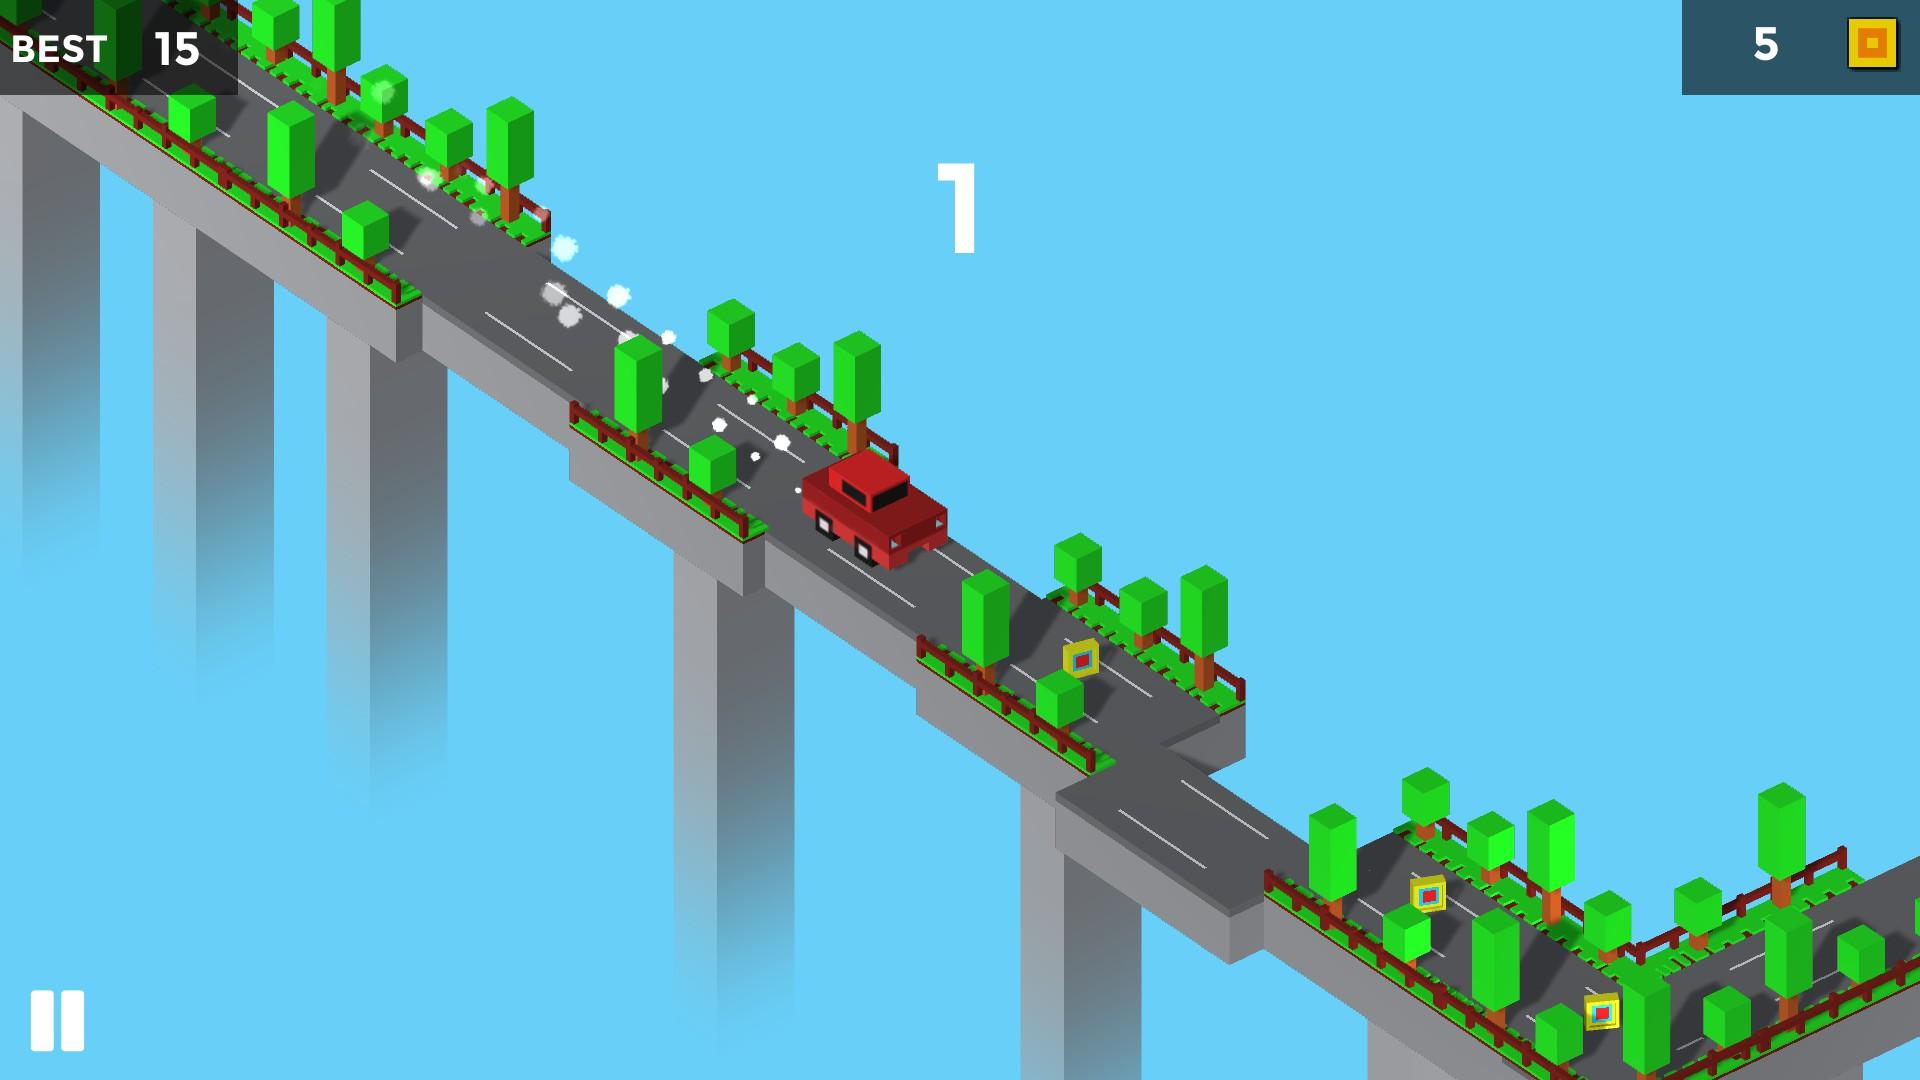 Pixel traffic: risky bridge drop